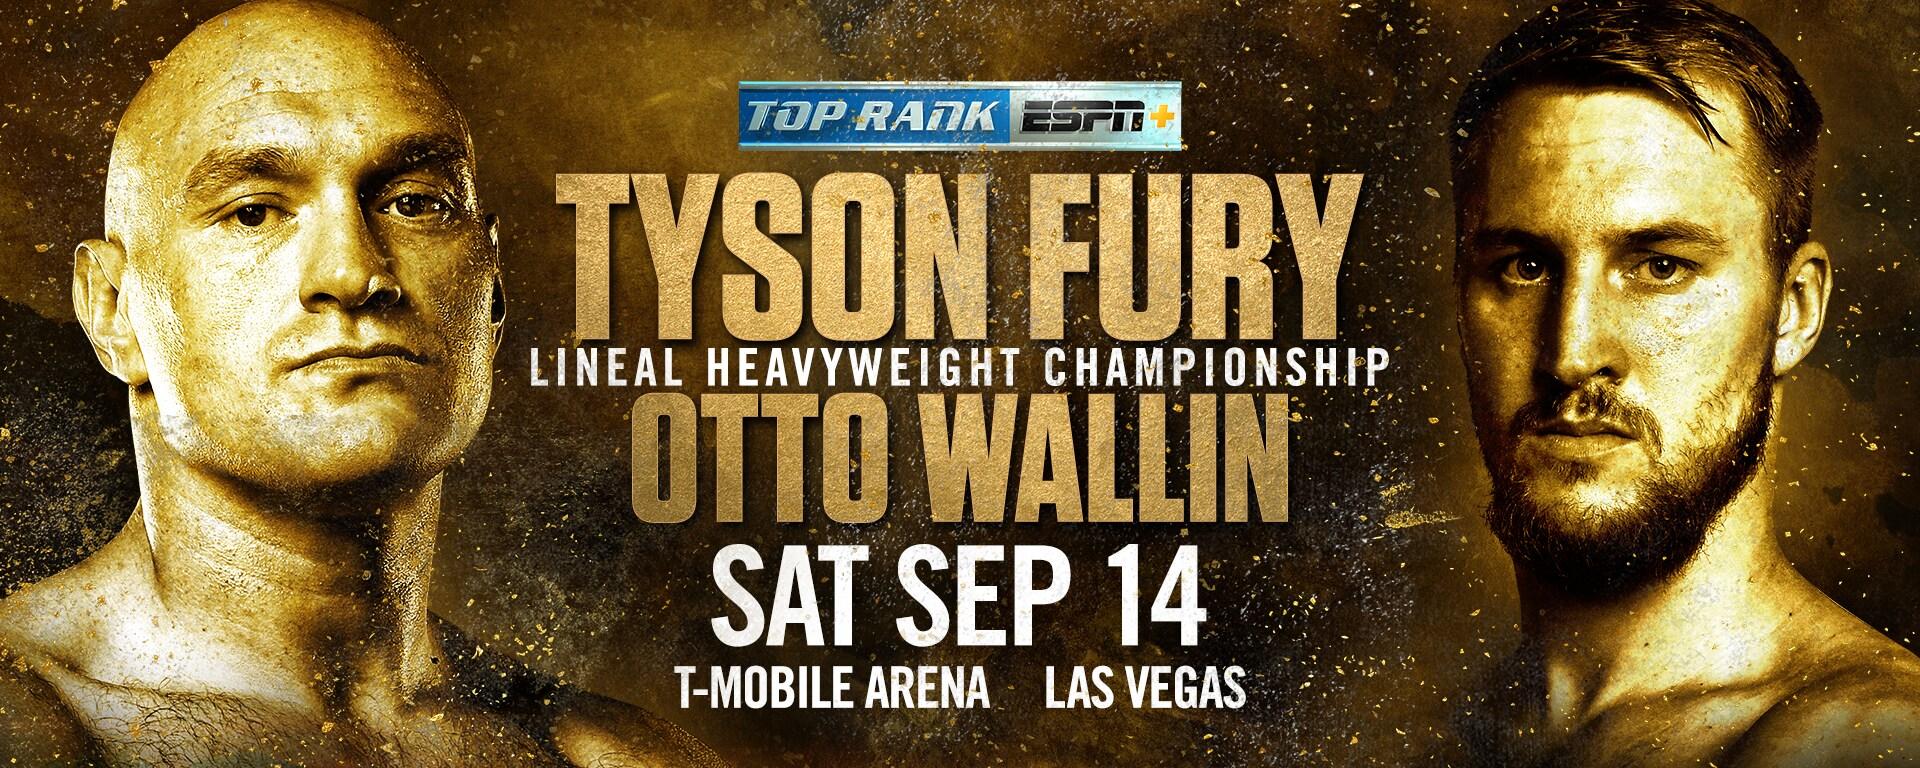 Image of Tyson Fury and Otto Wallin over Las Vegas Skyline